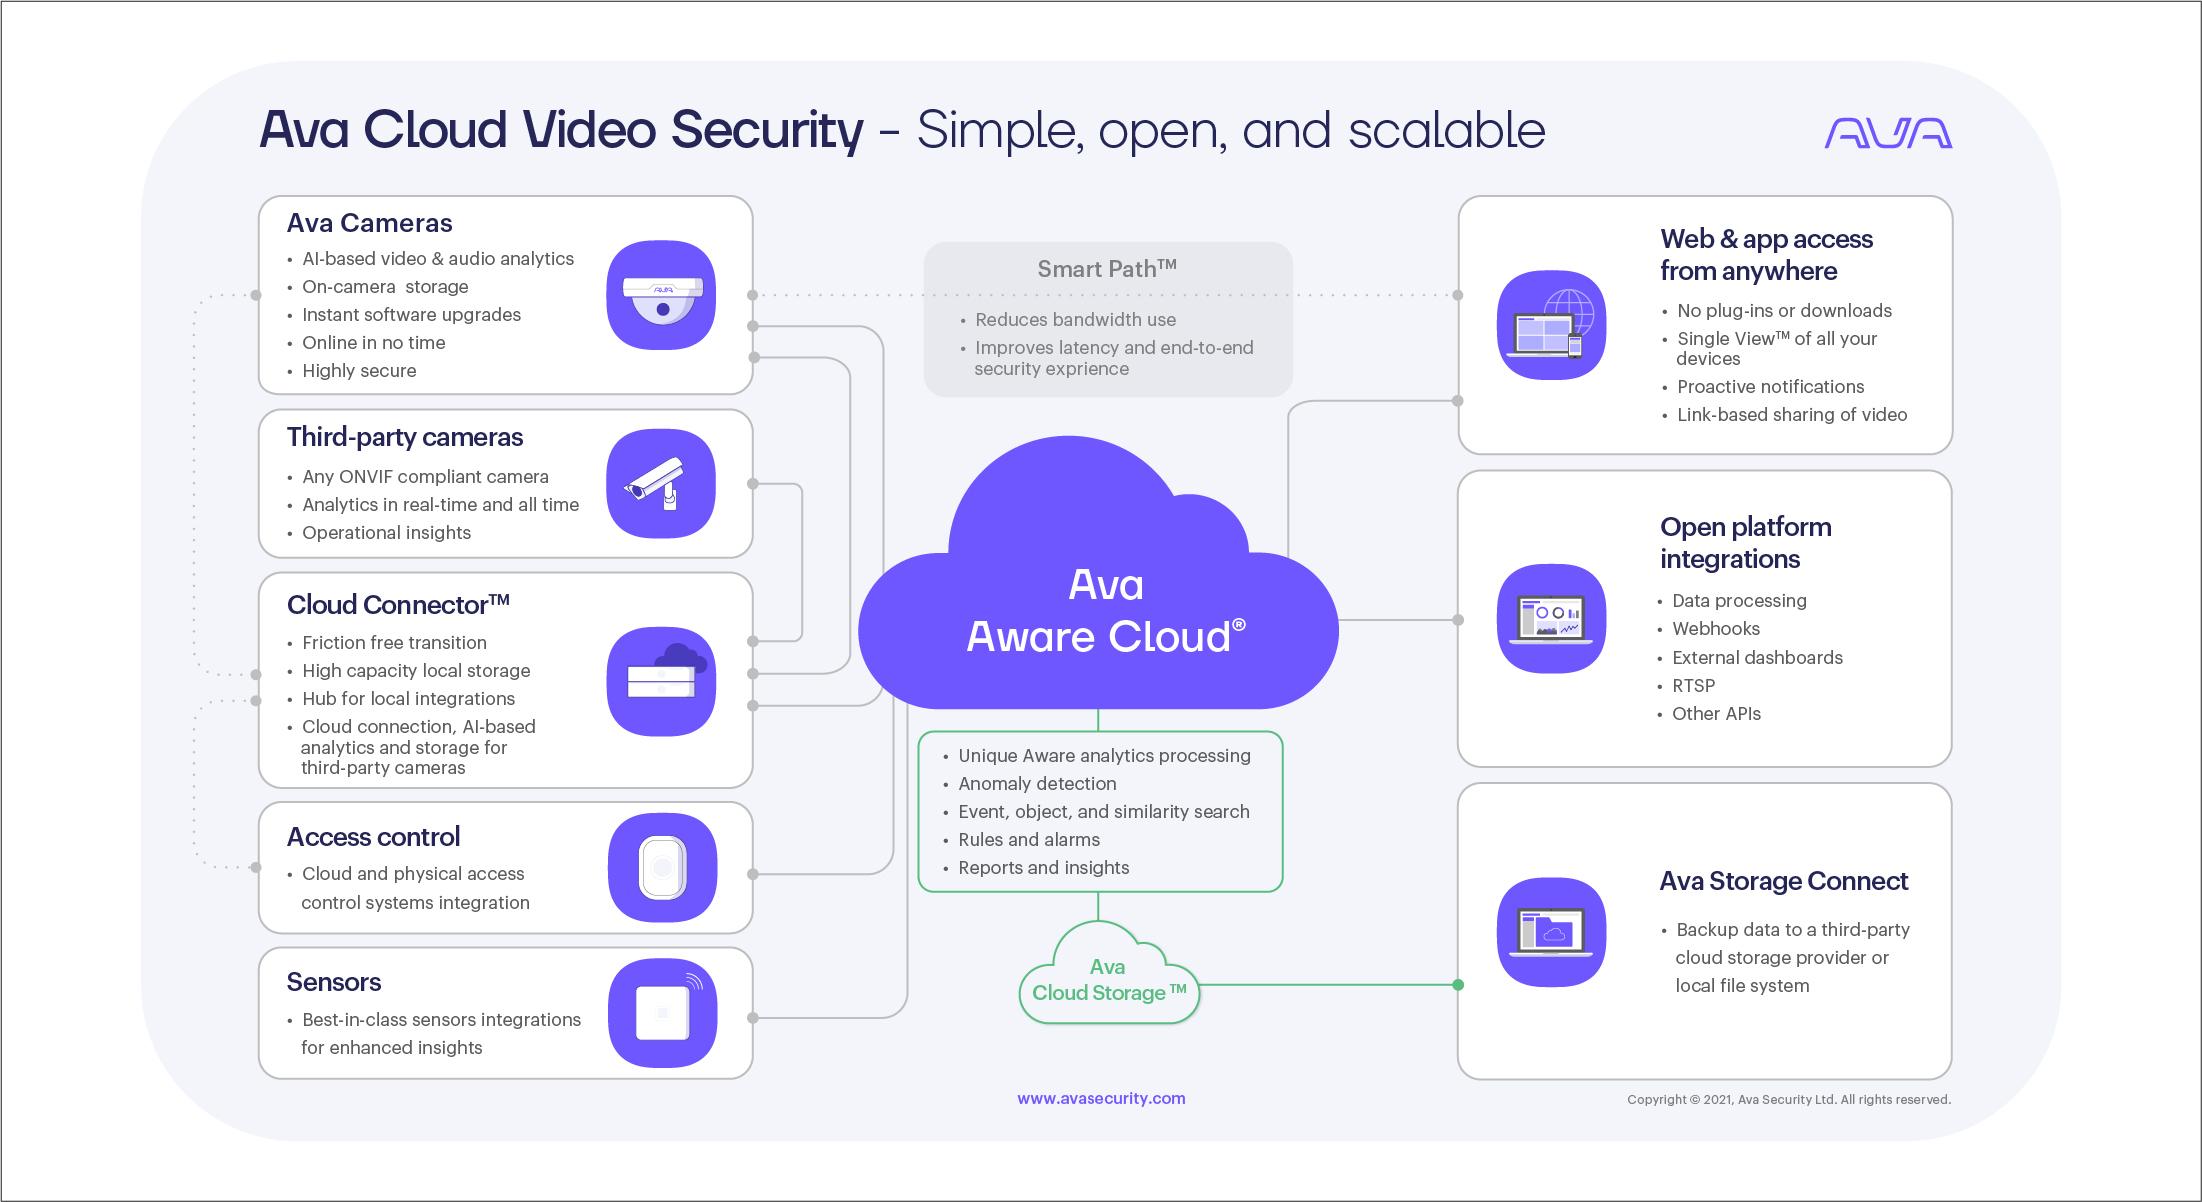 Ava Cloud Video Security Architecture - light